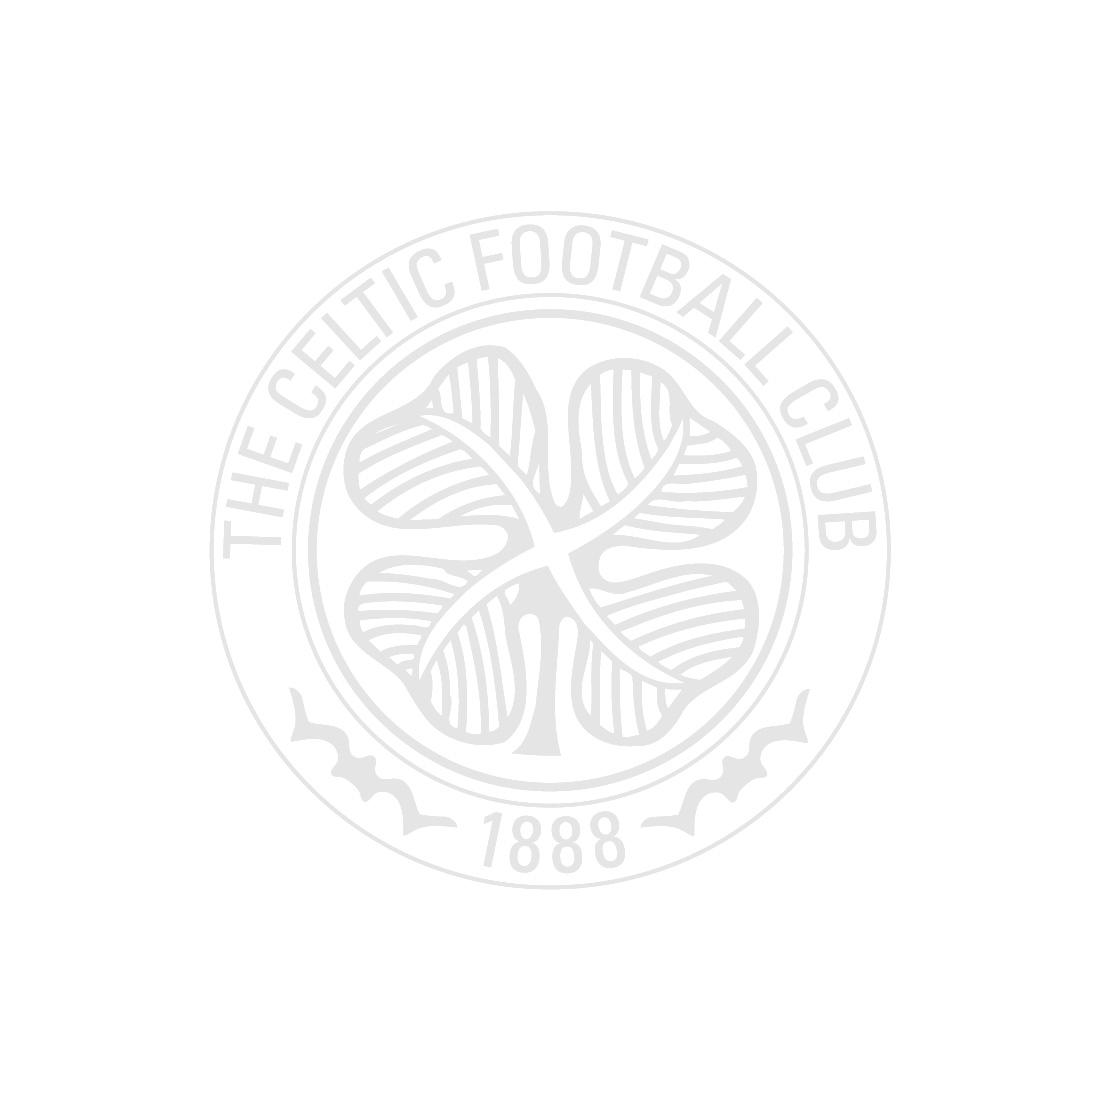 Celtic Limited Edition Ntcham & Rogic Signed Print